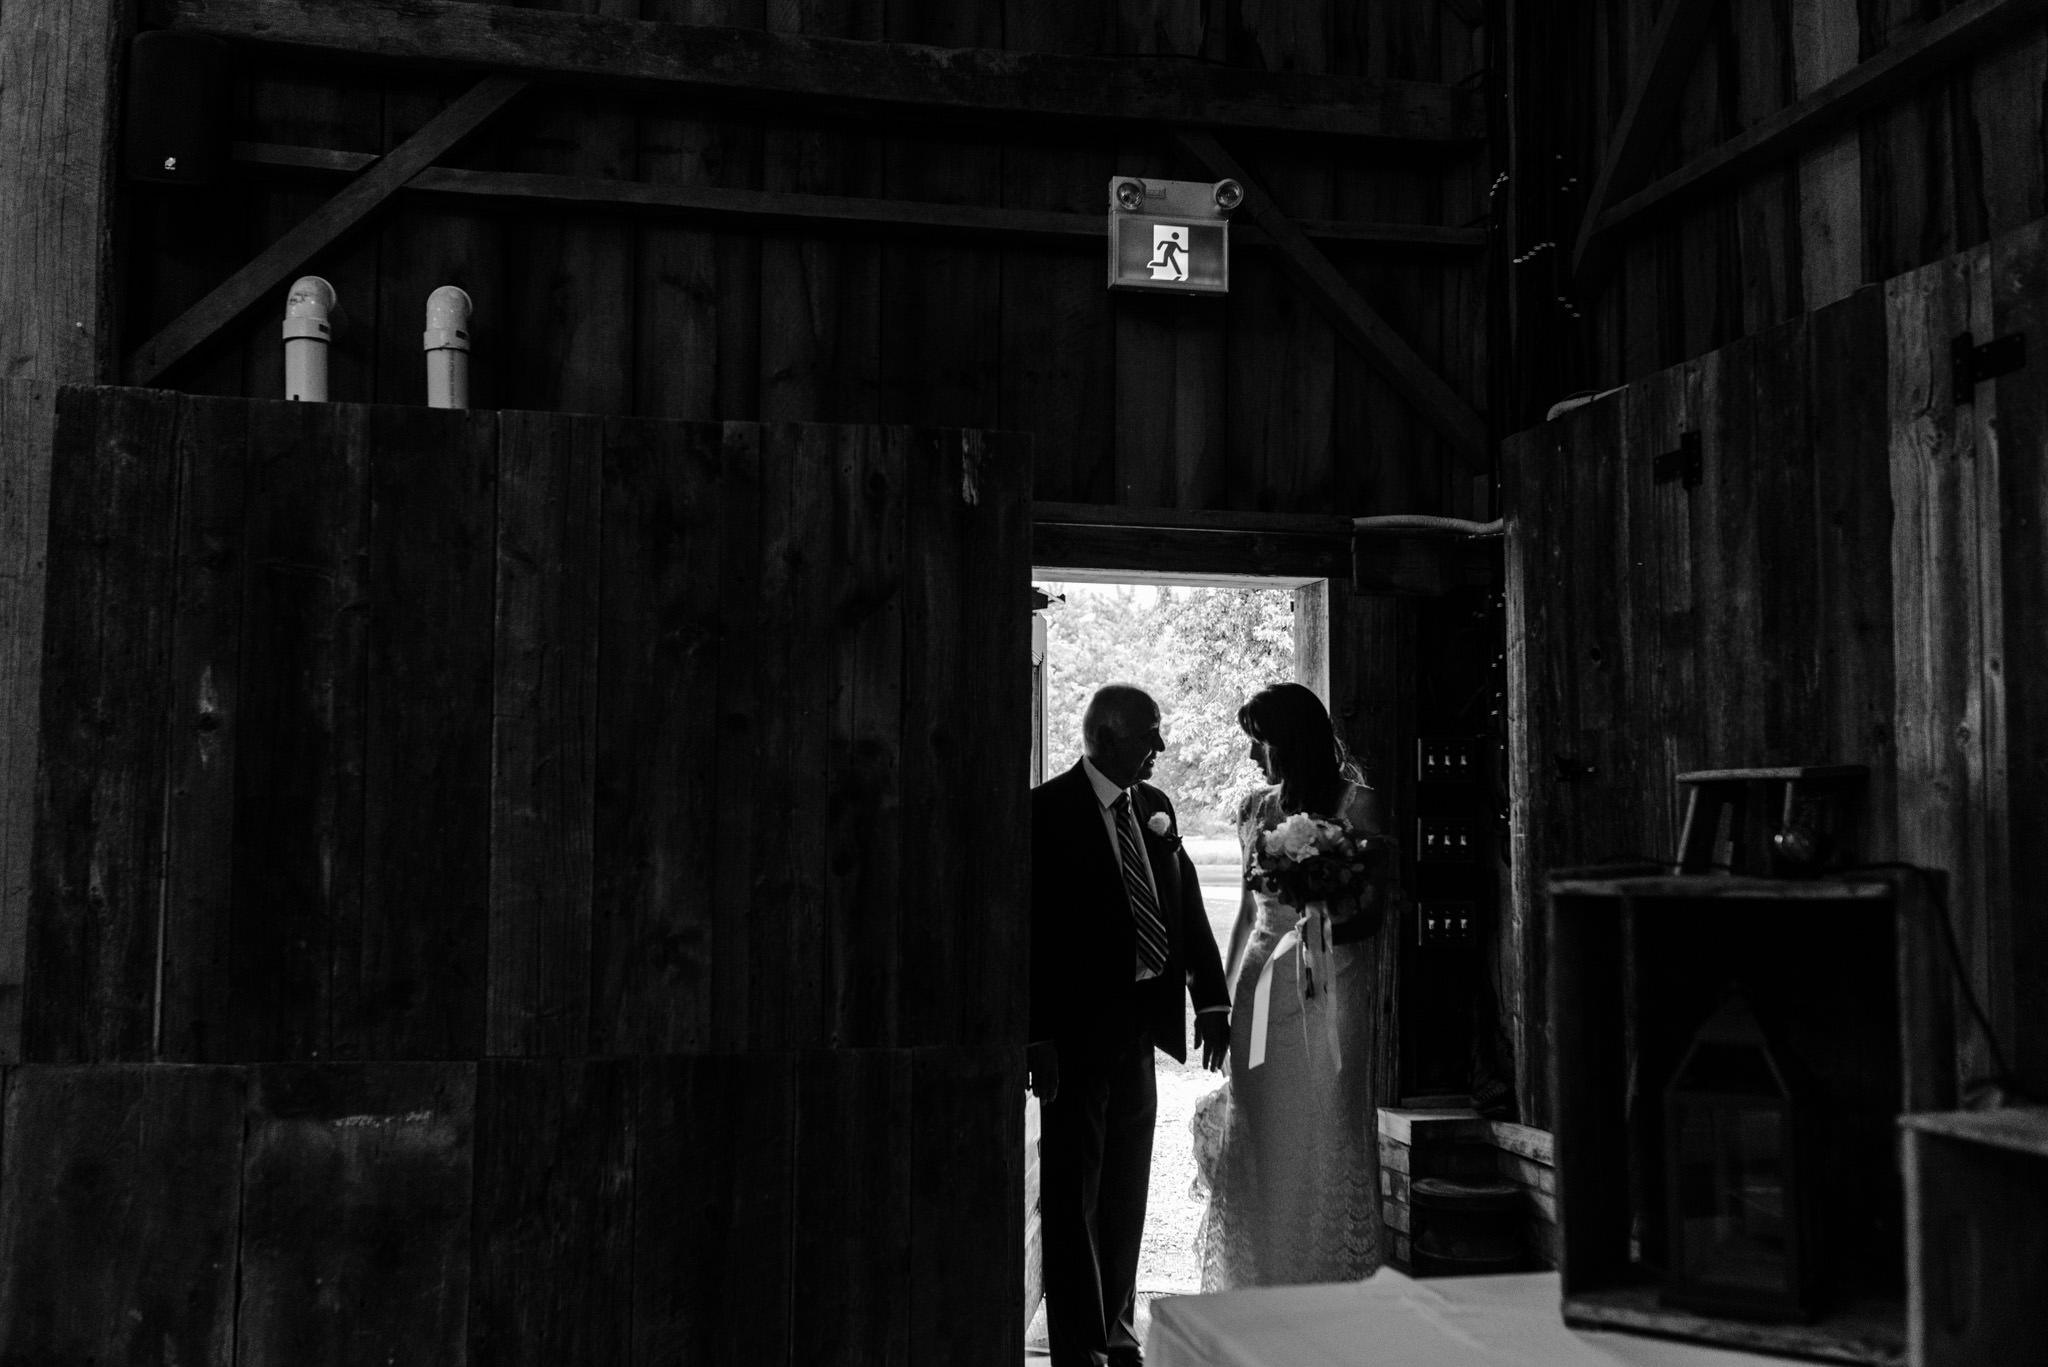 130-wedding-ceremony-in-the-rain-toronto-photographer.jpg